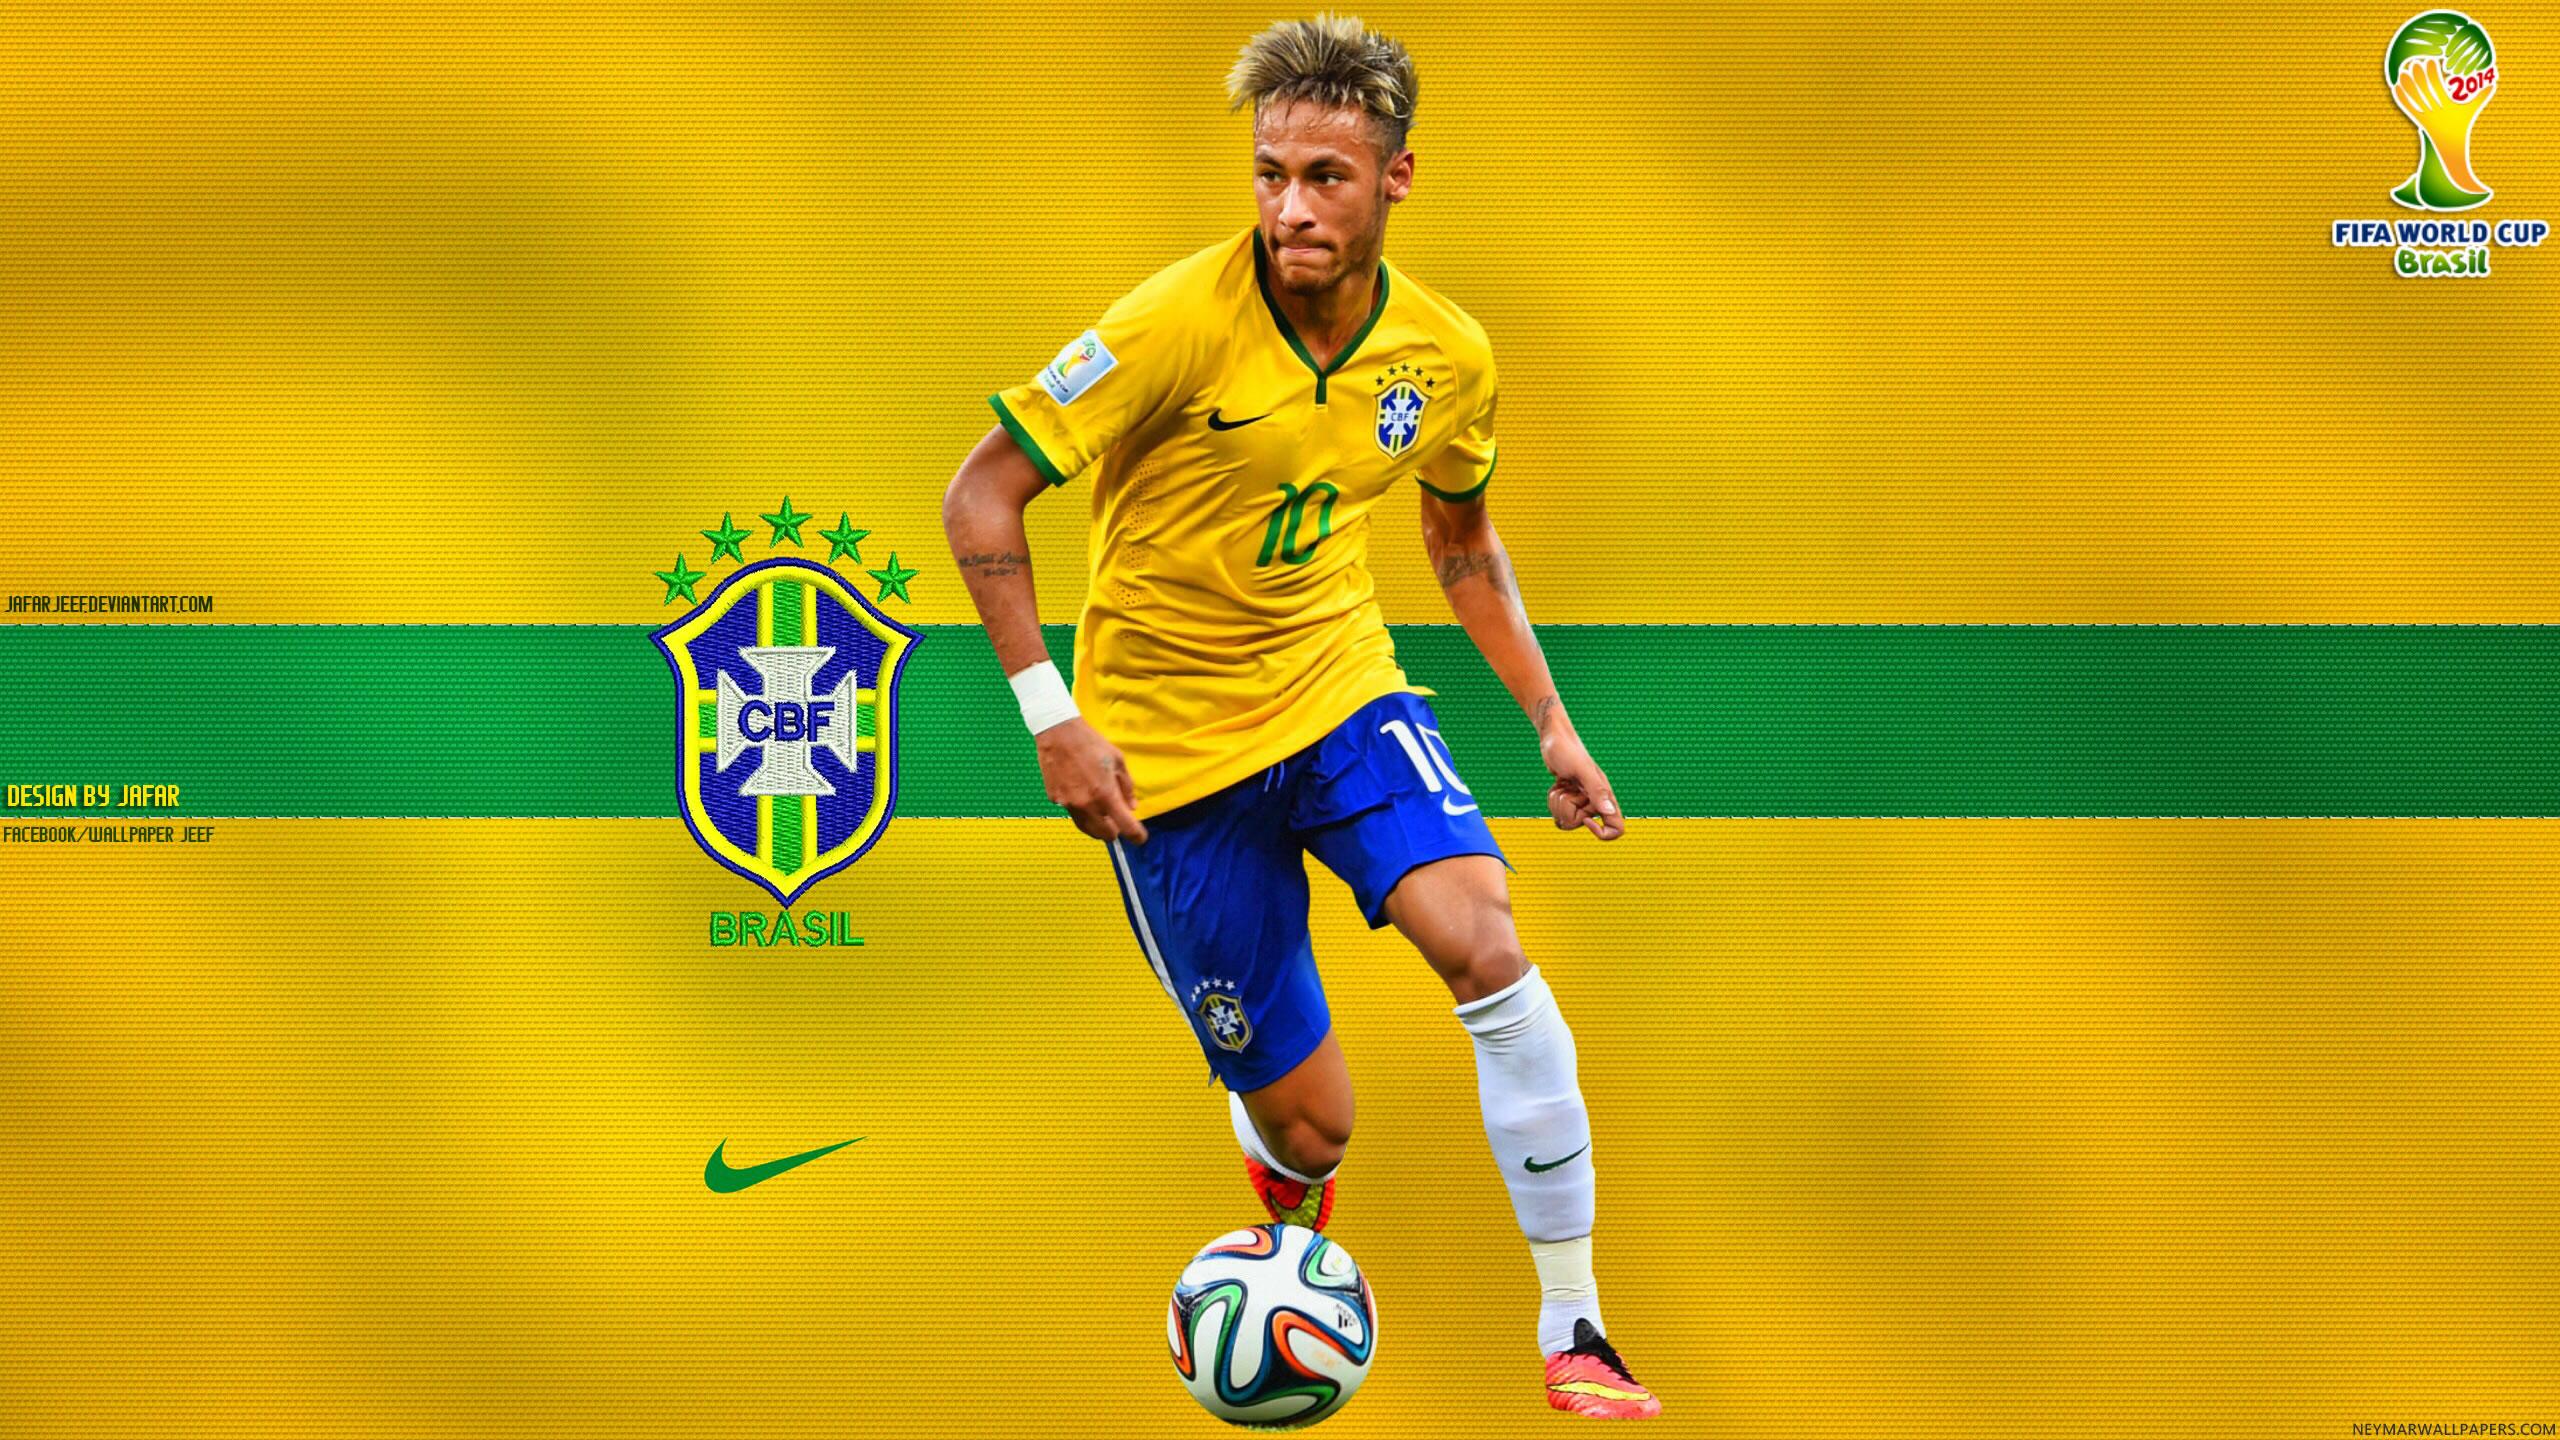 Neymar Brazil 2014 World Cup wallpaper by Jafar